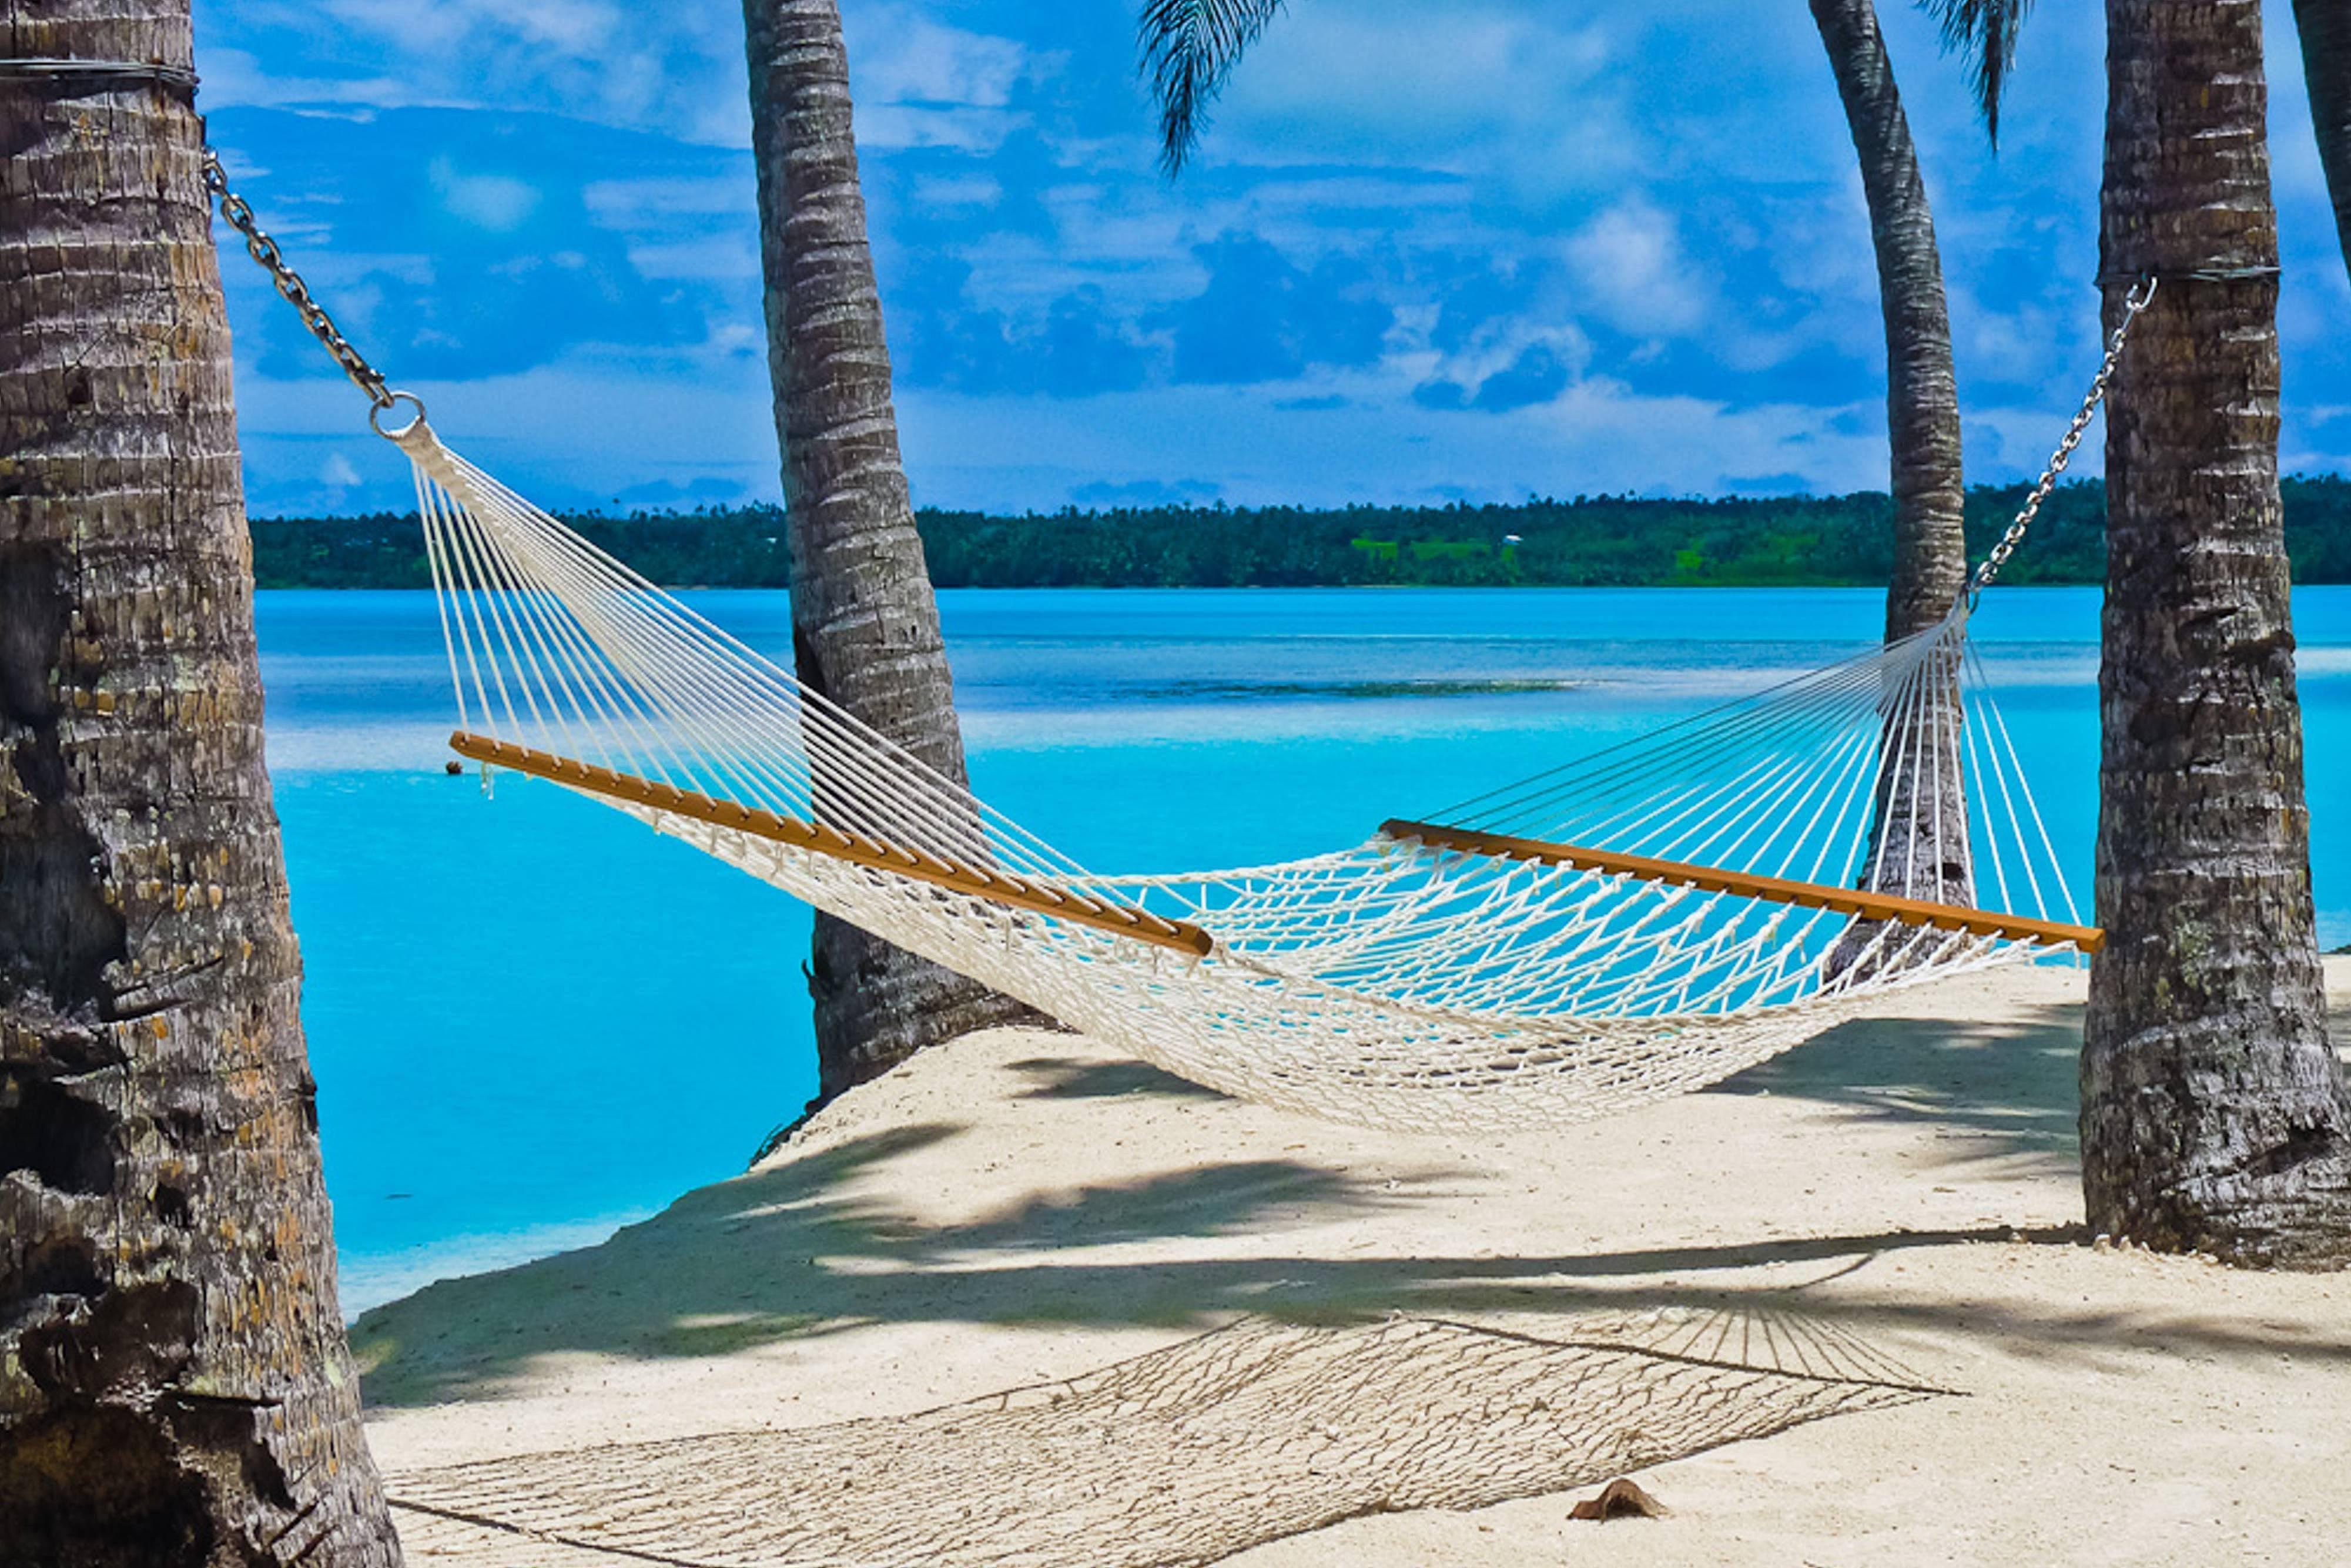 Beautiful Beach Hammock Backgrounds Hd Images 3 HD ...